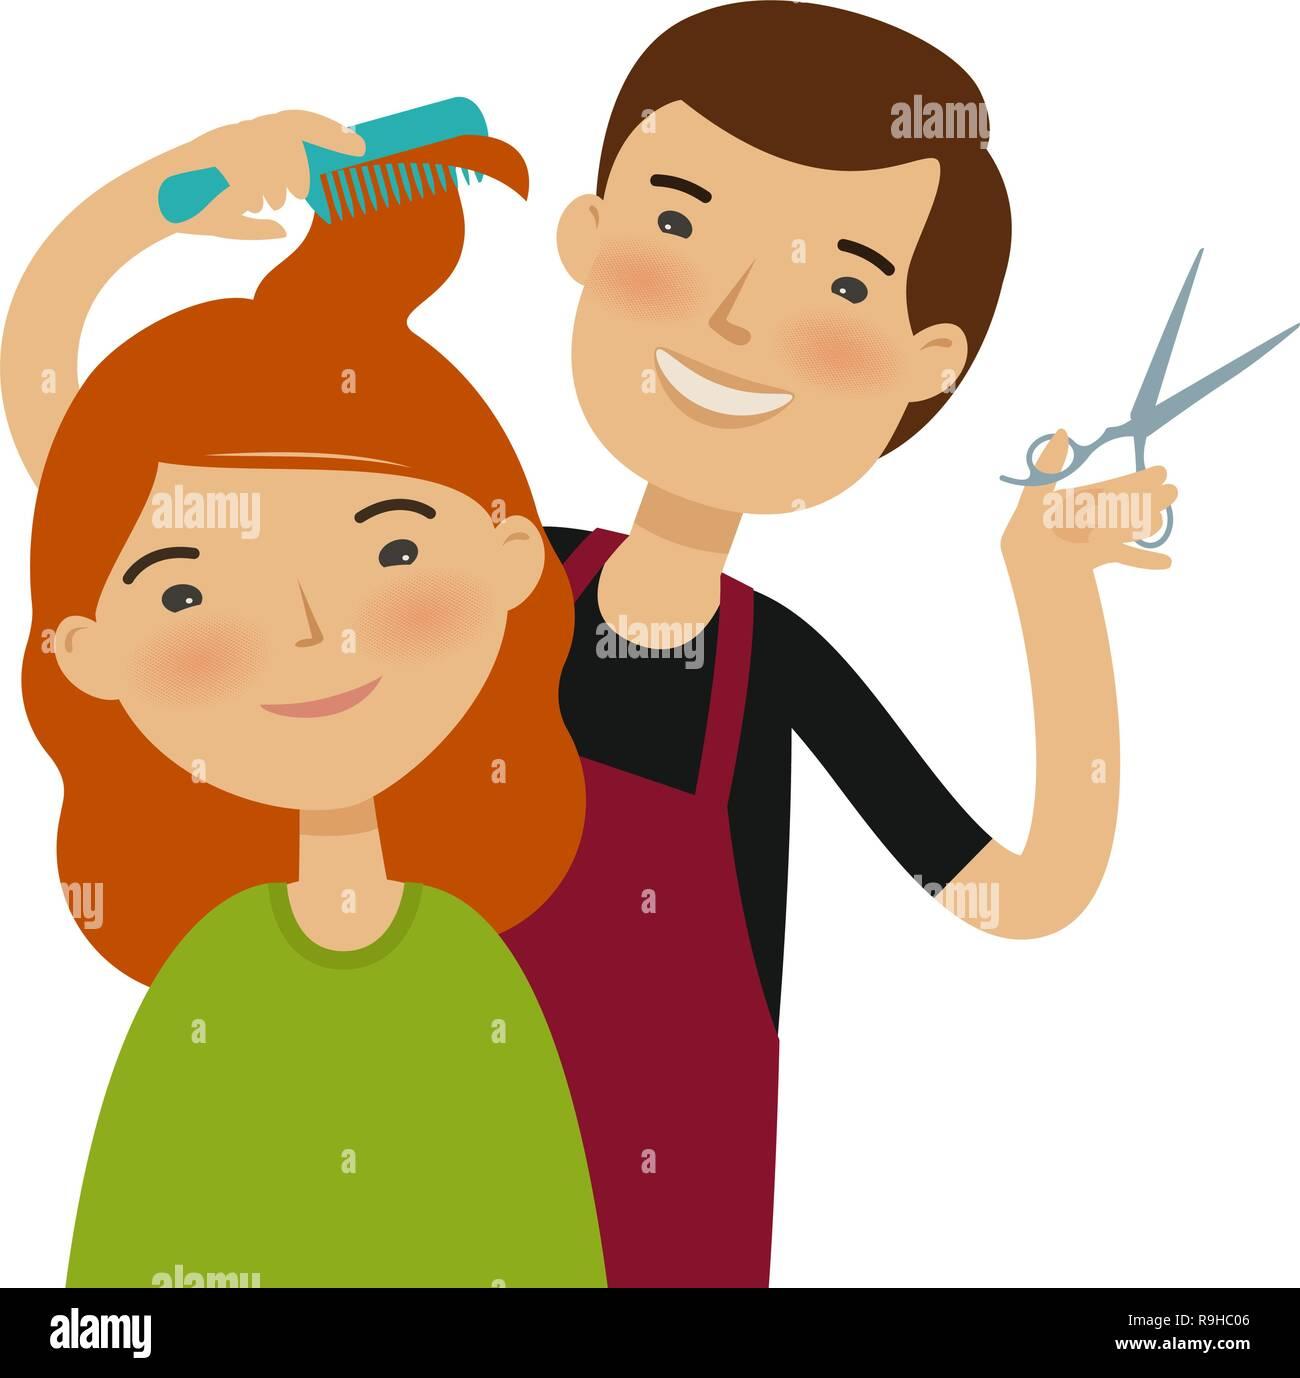 cartoon hair haircut cutting illustration funny hairstylist vector beauty concept saloon alamy fashion comic